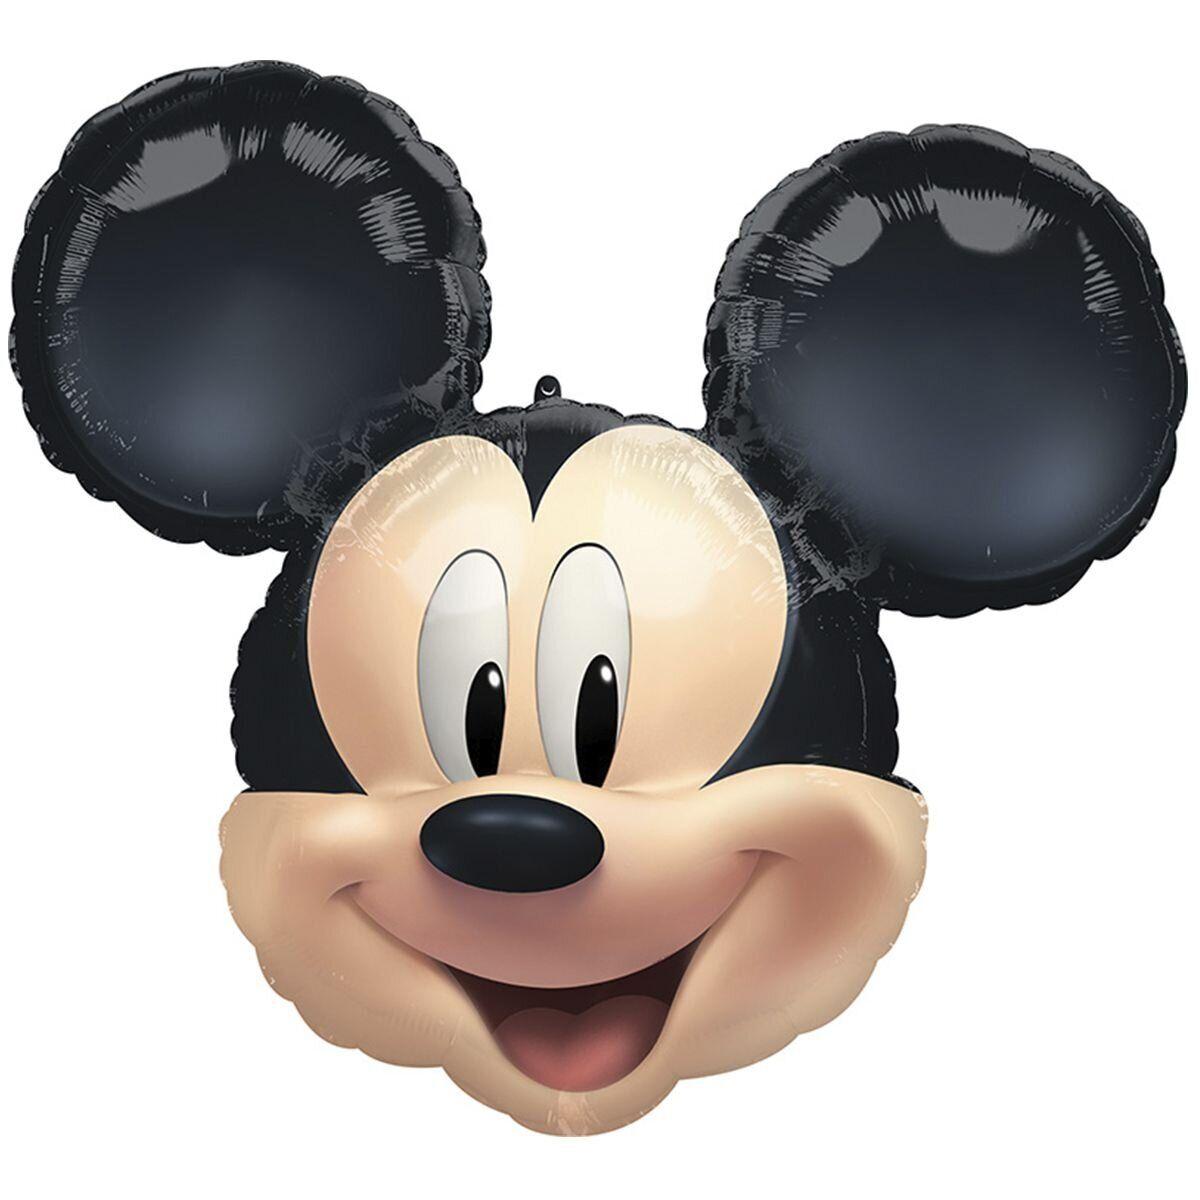 Микки Маус навсегда! Голова / A 25 Фигура